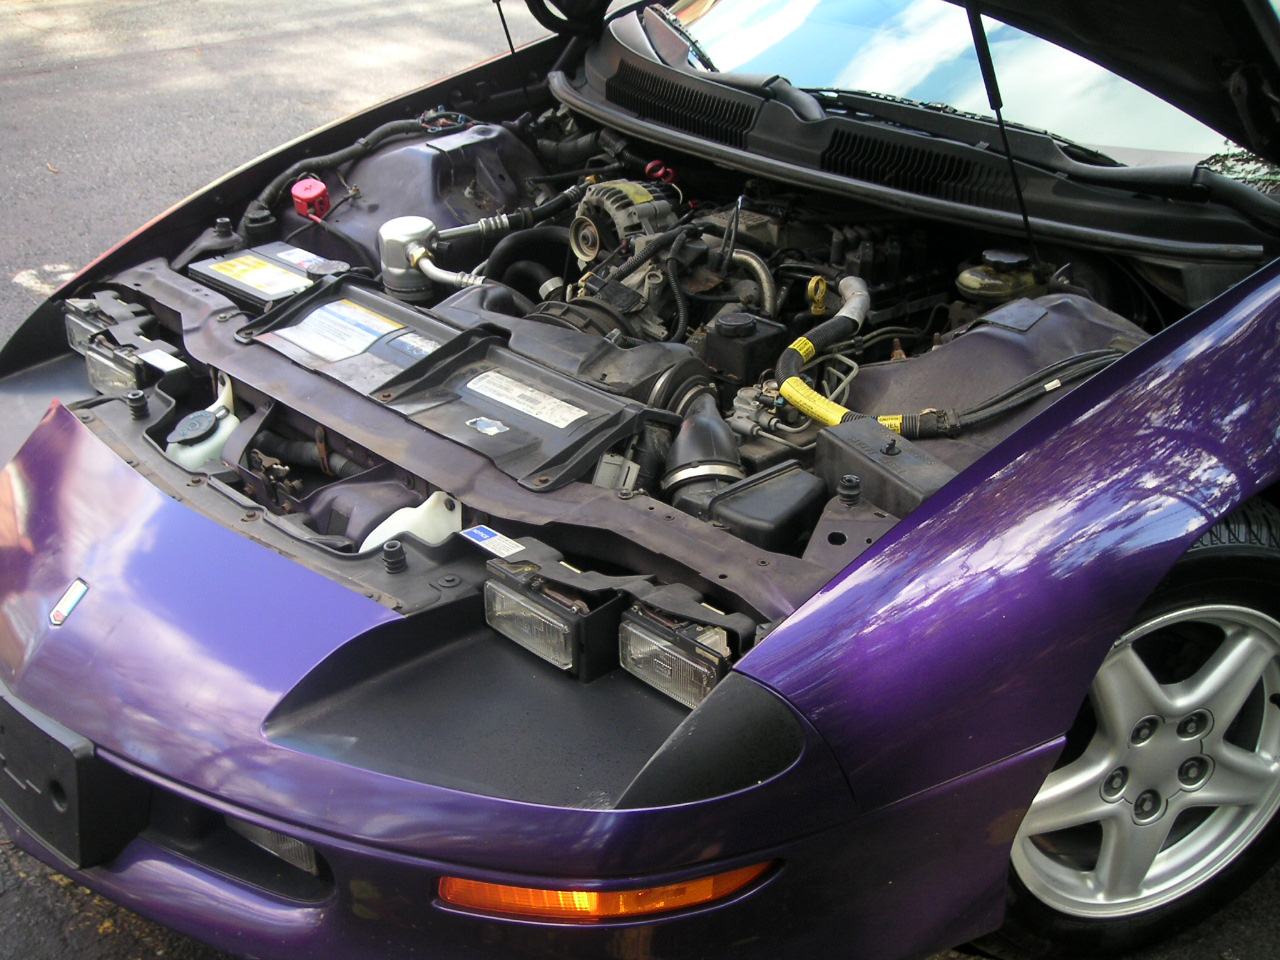 similiar 97 camaro engine keywords 1997 to 1998 bright purple metallic camaro rs z28 don t quote pics